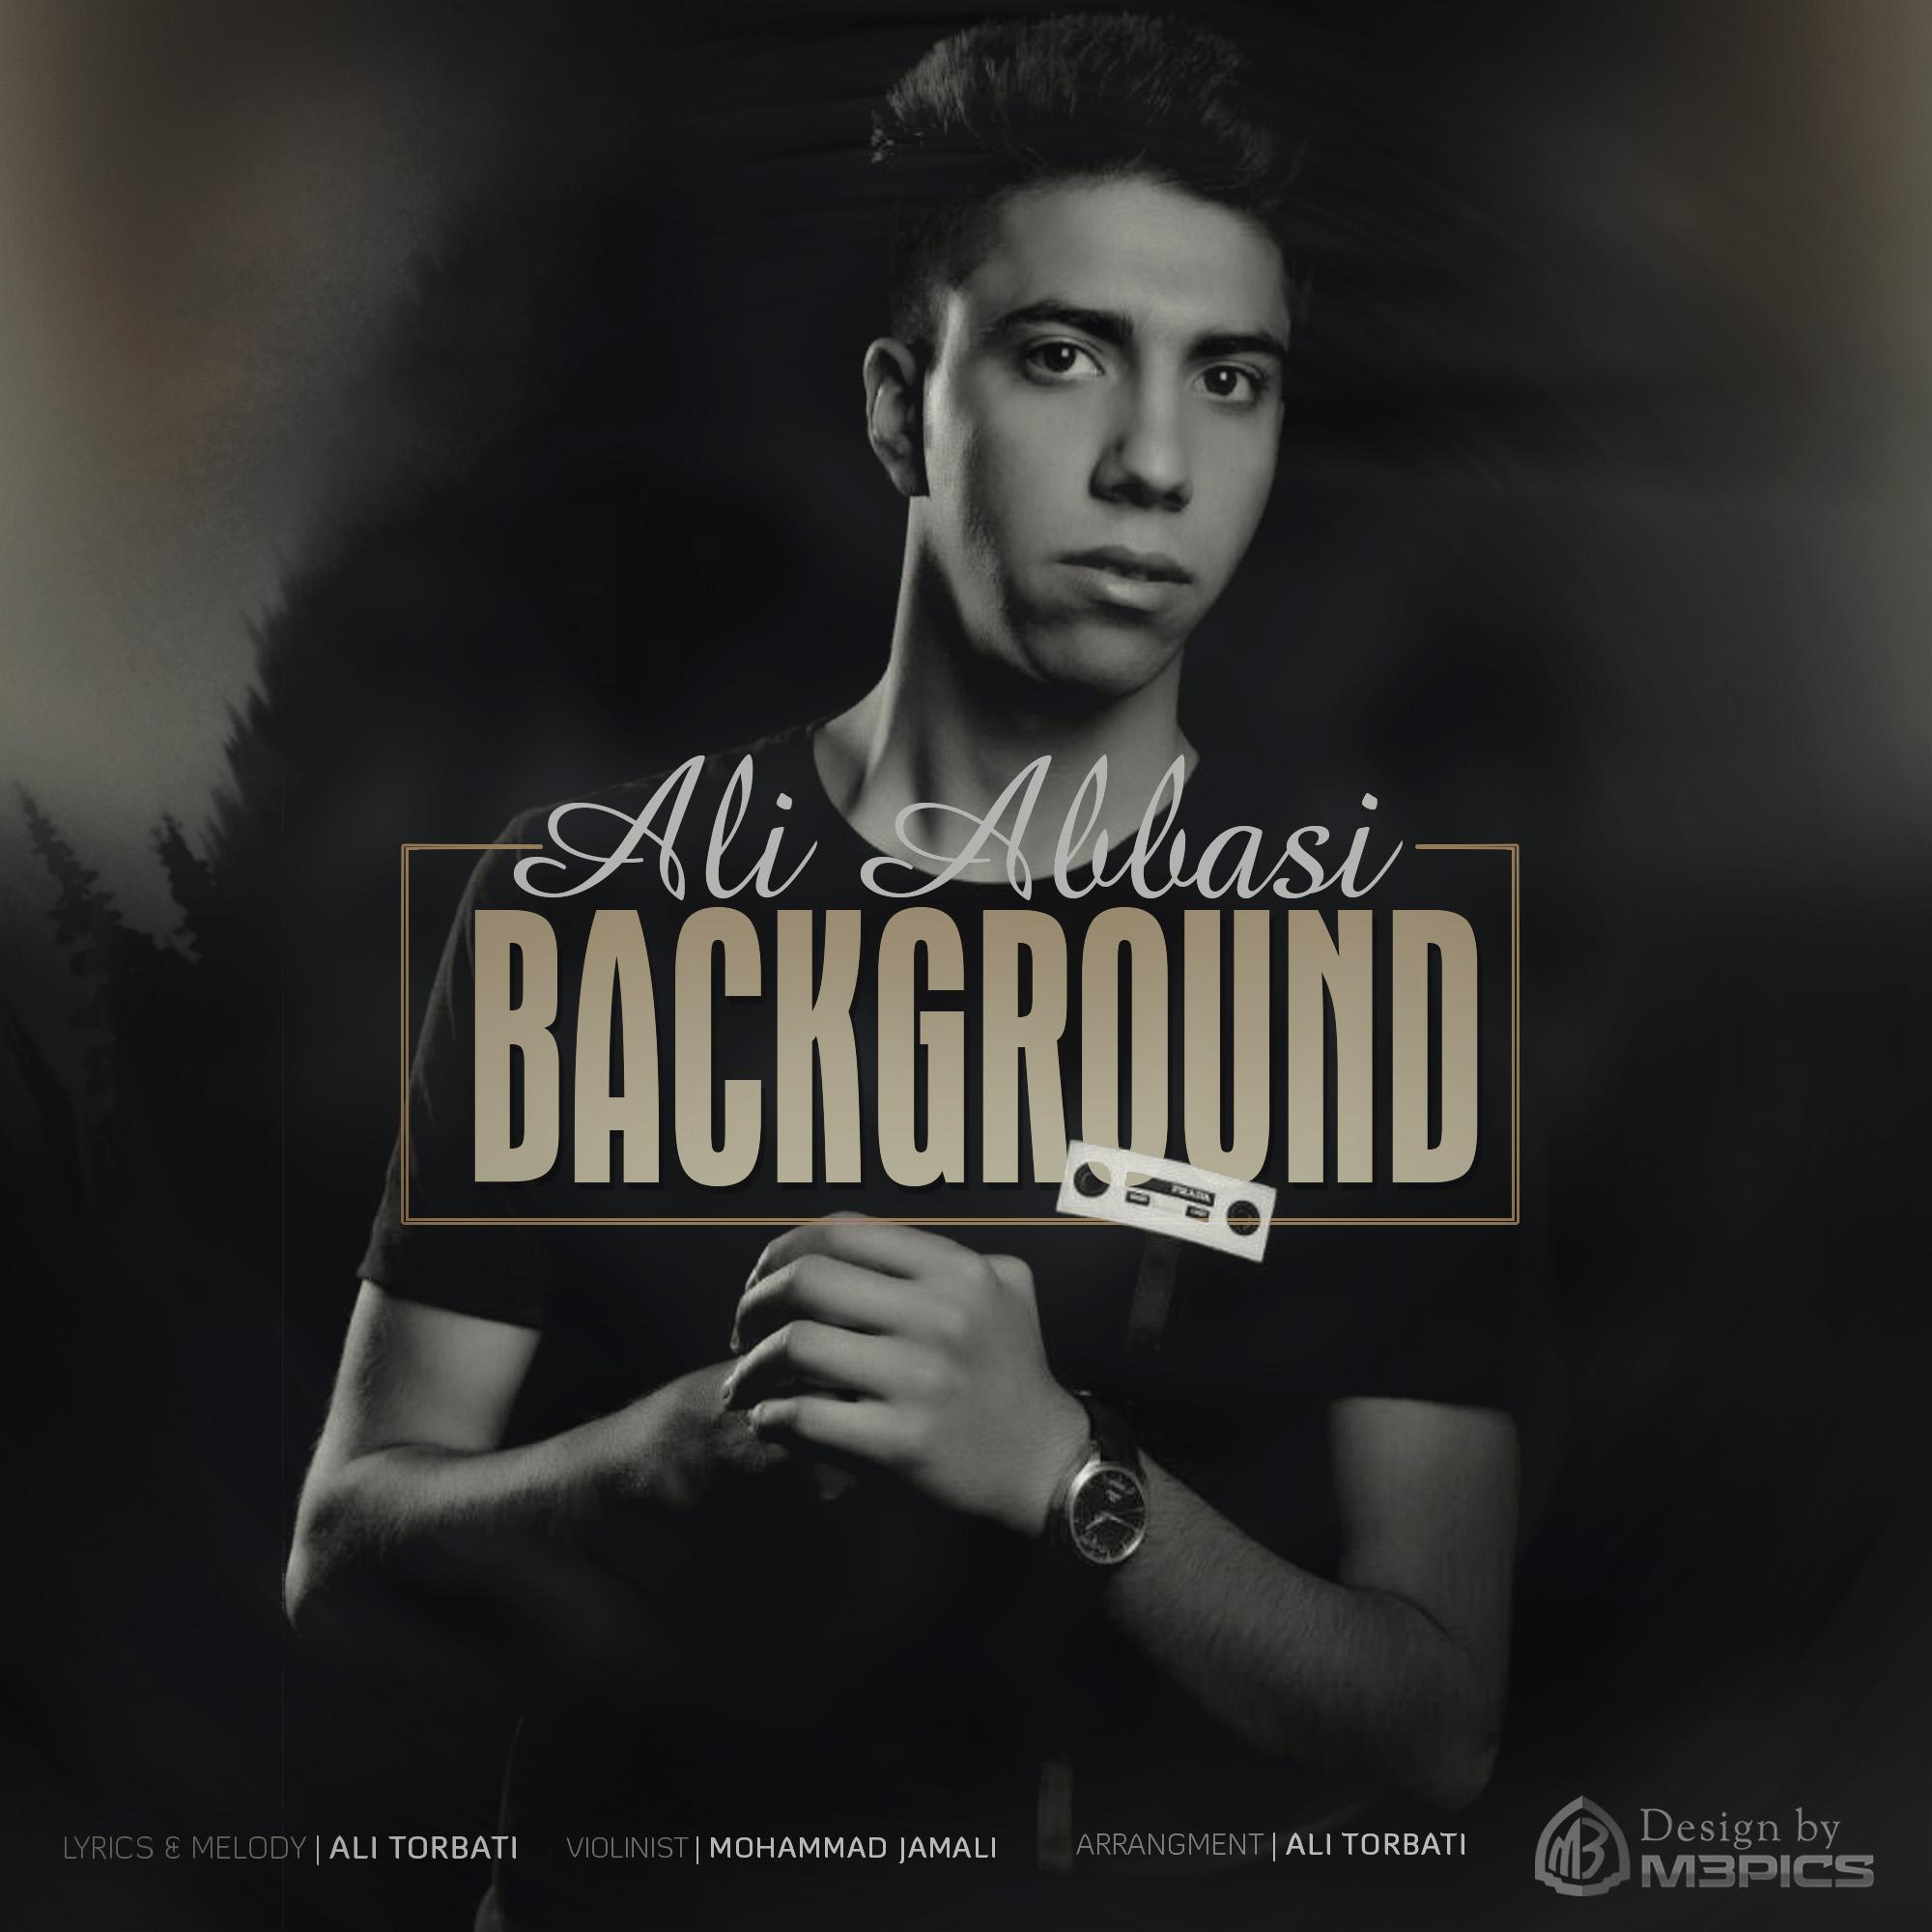 Ali Abbasi – Background